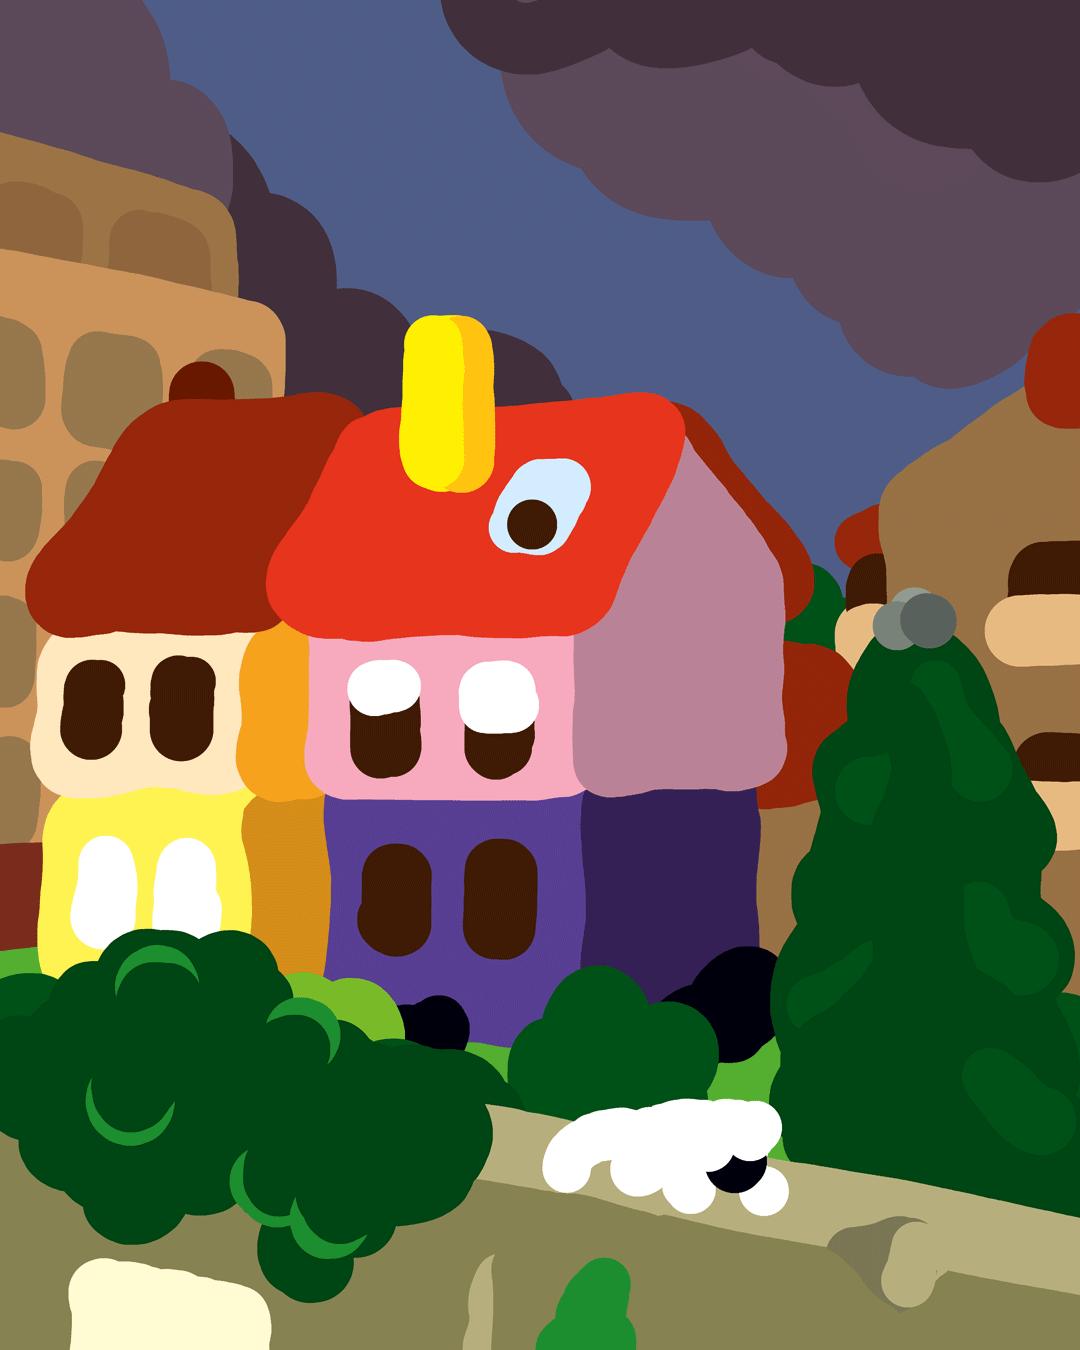 Maisons s